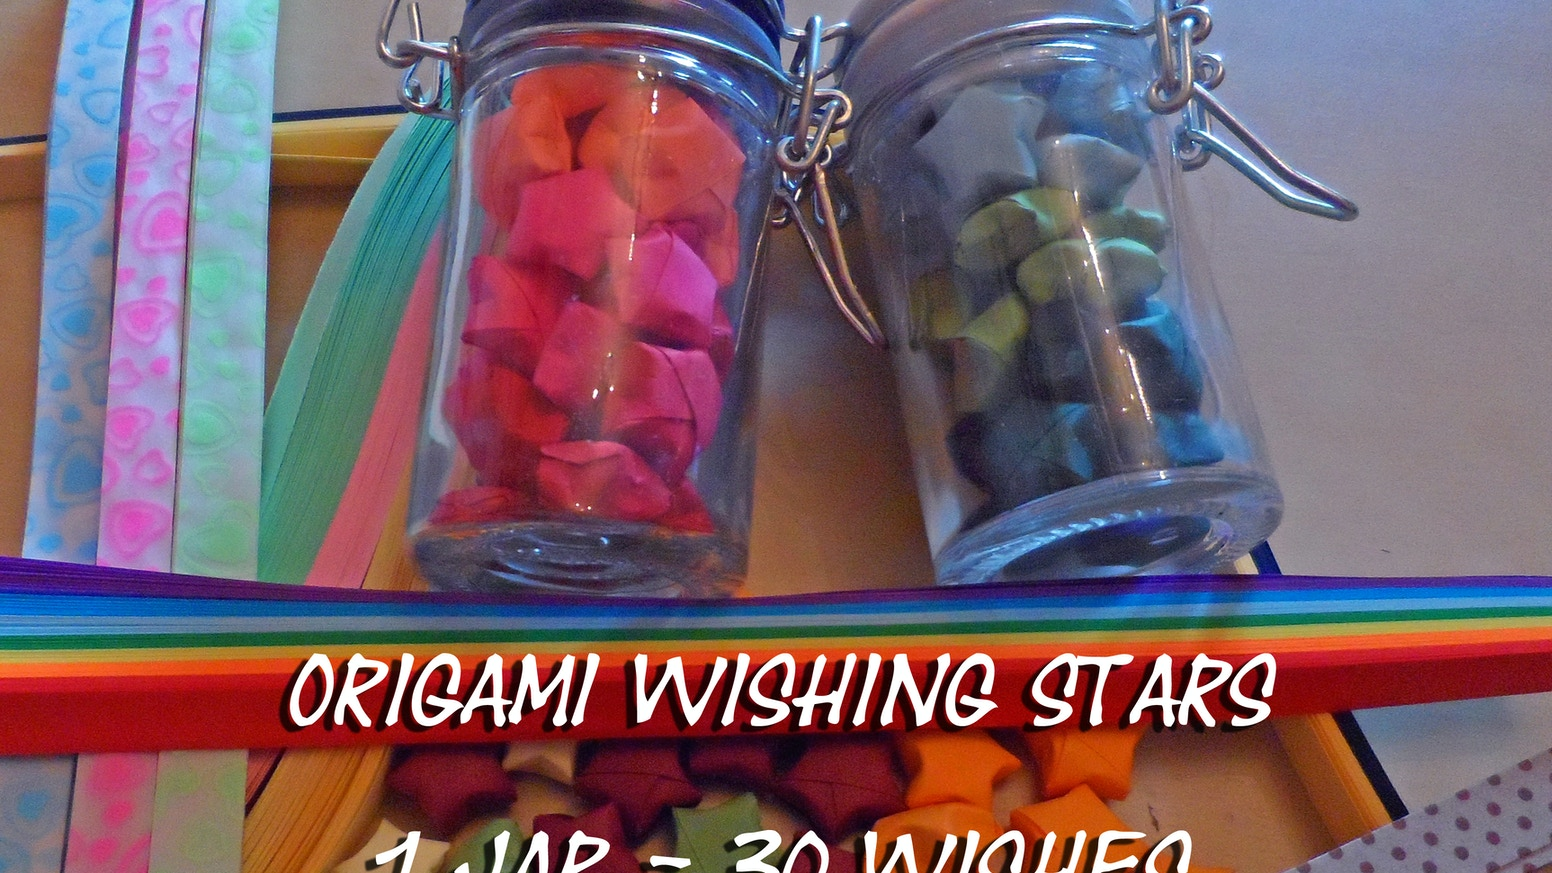 Origami Wishing Star Jars